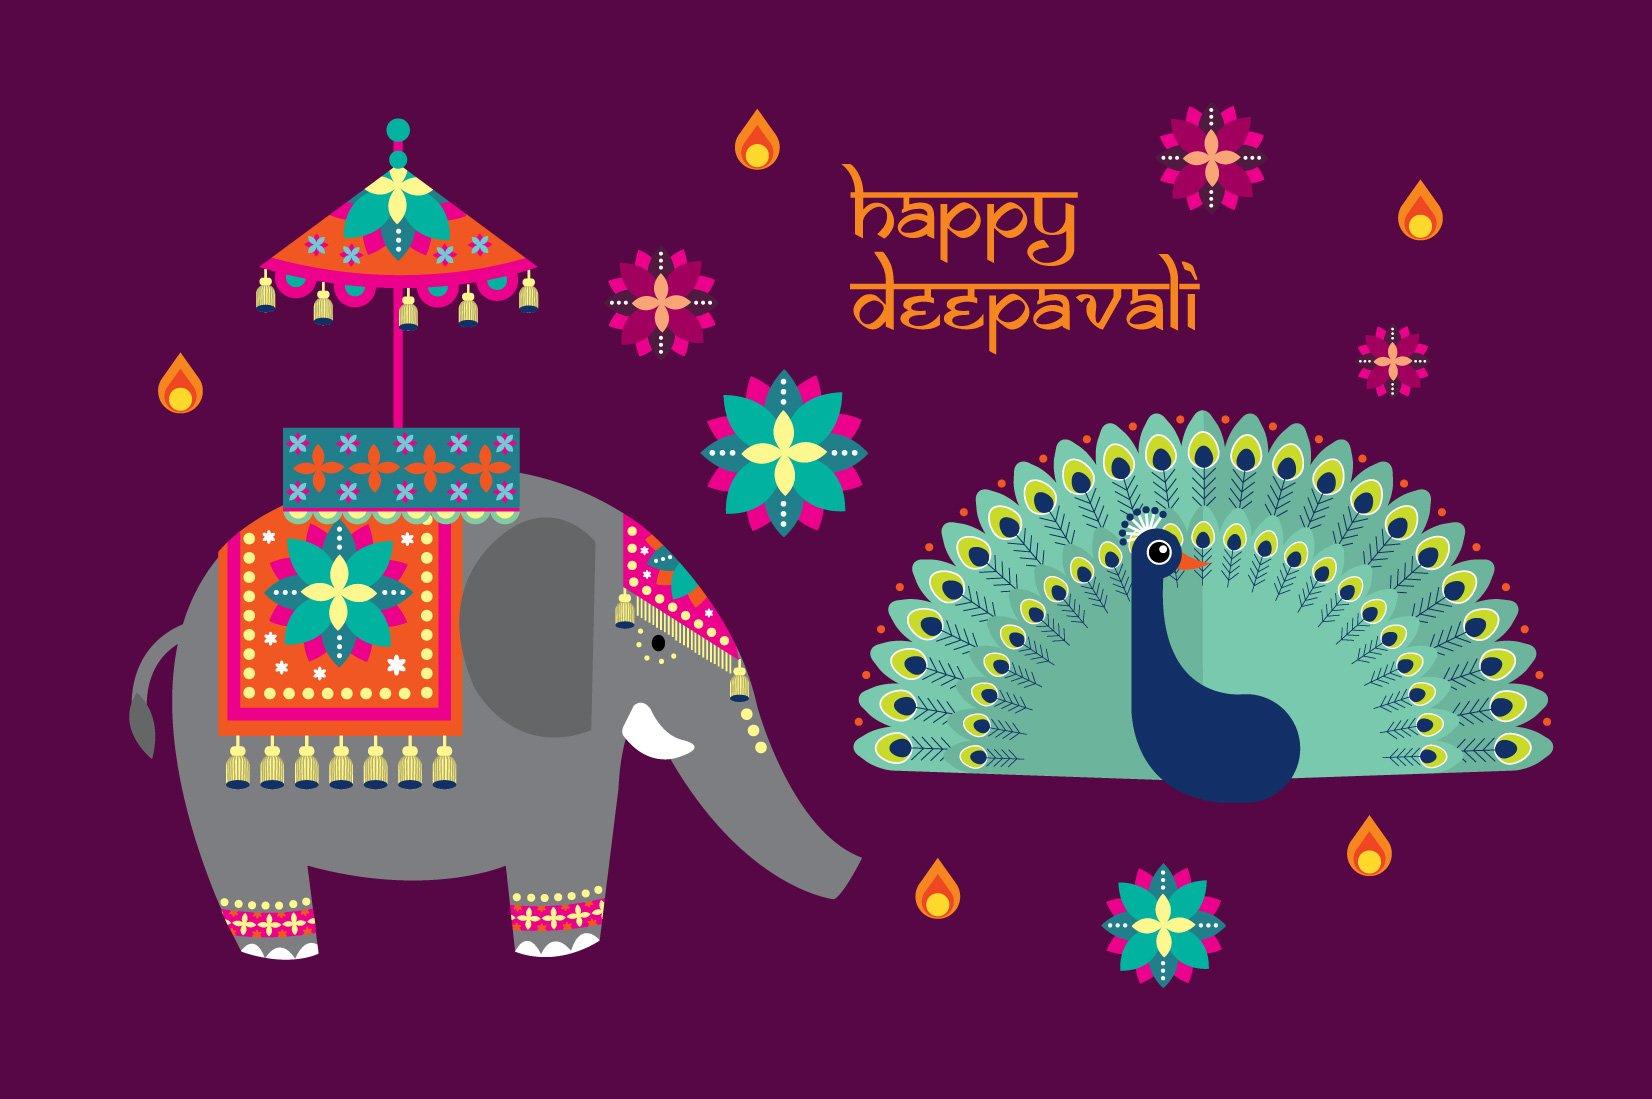 Diwali Photos, Graphics, Fonts, Themes, Templates ~ Creative Market